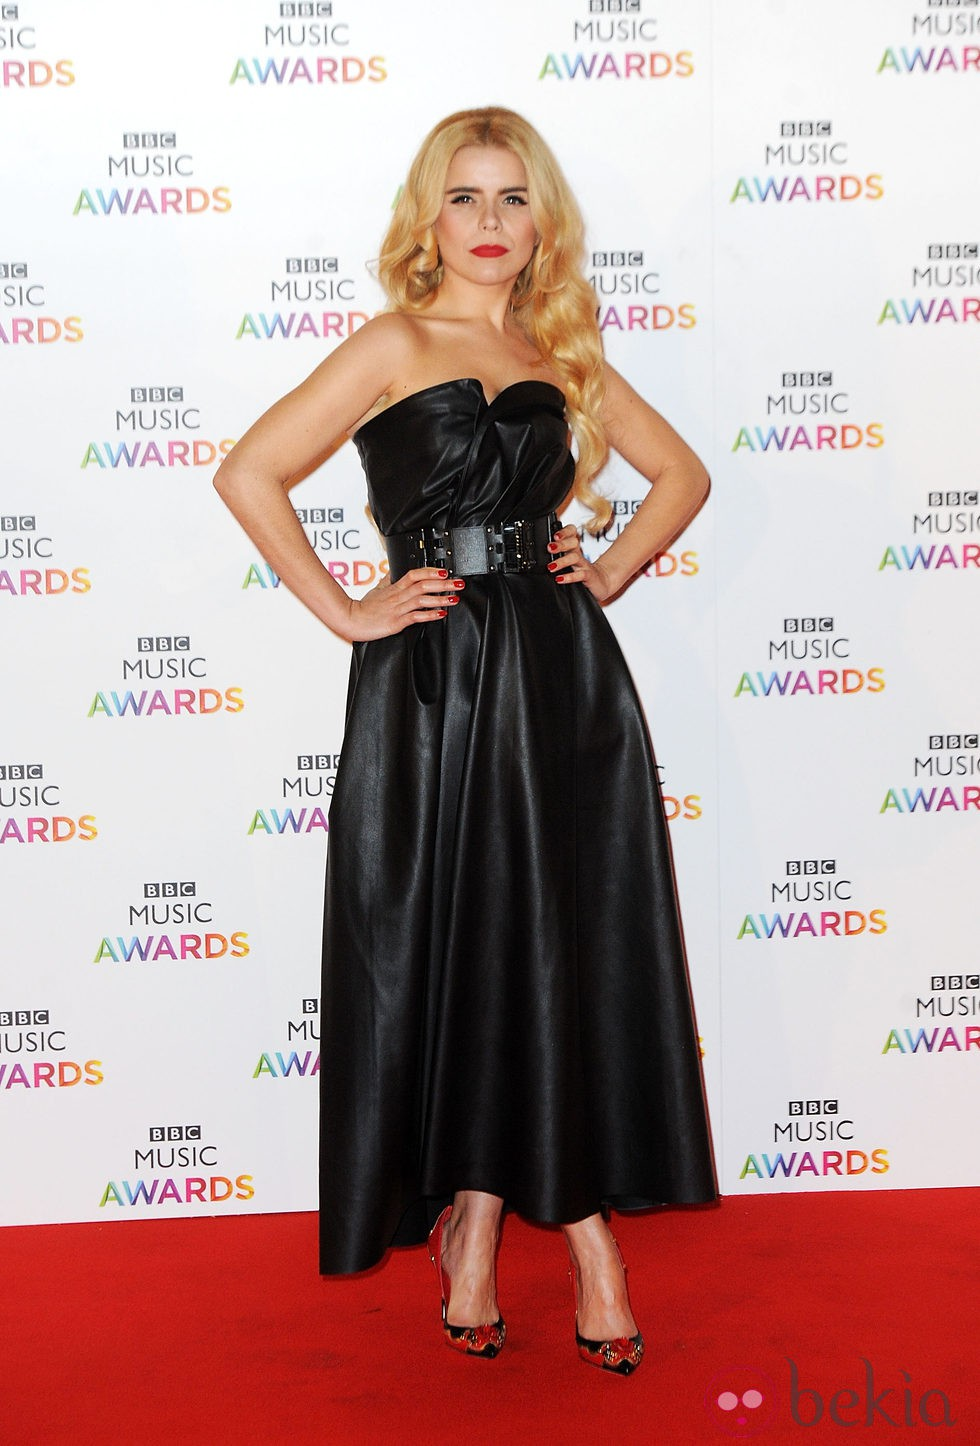 Paloma Faith en la entrega de los BBC Music Awards 2014